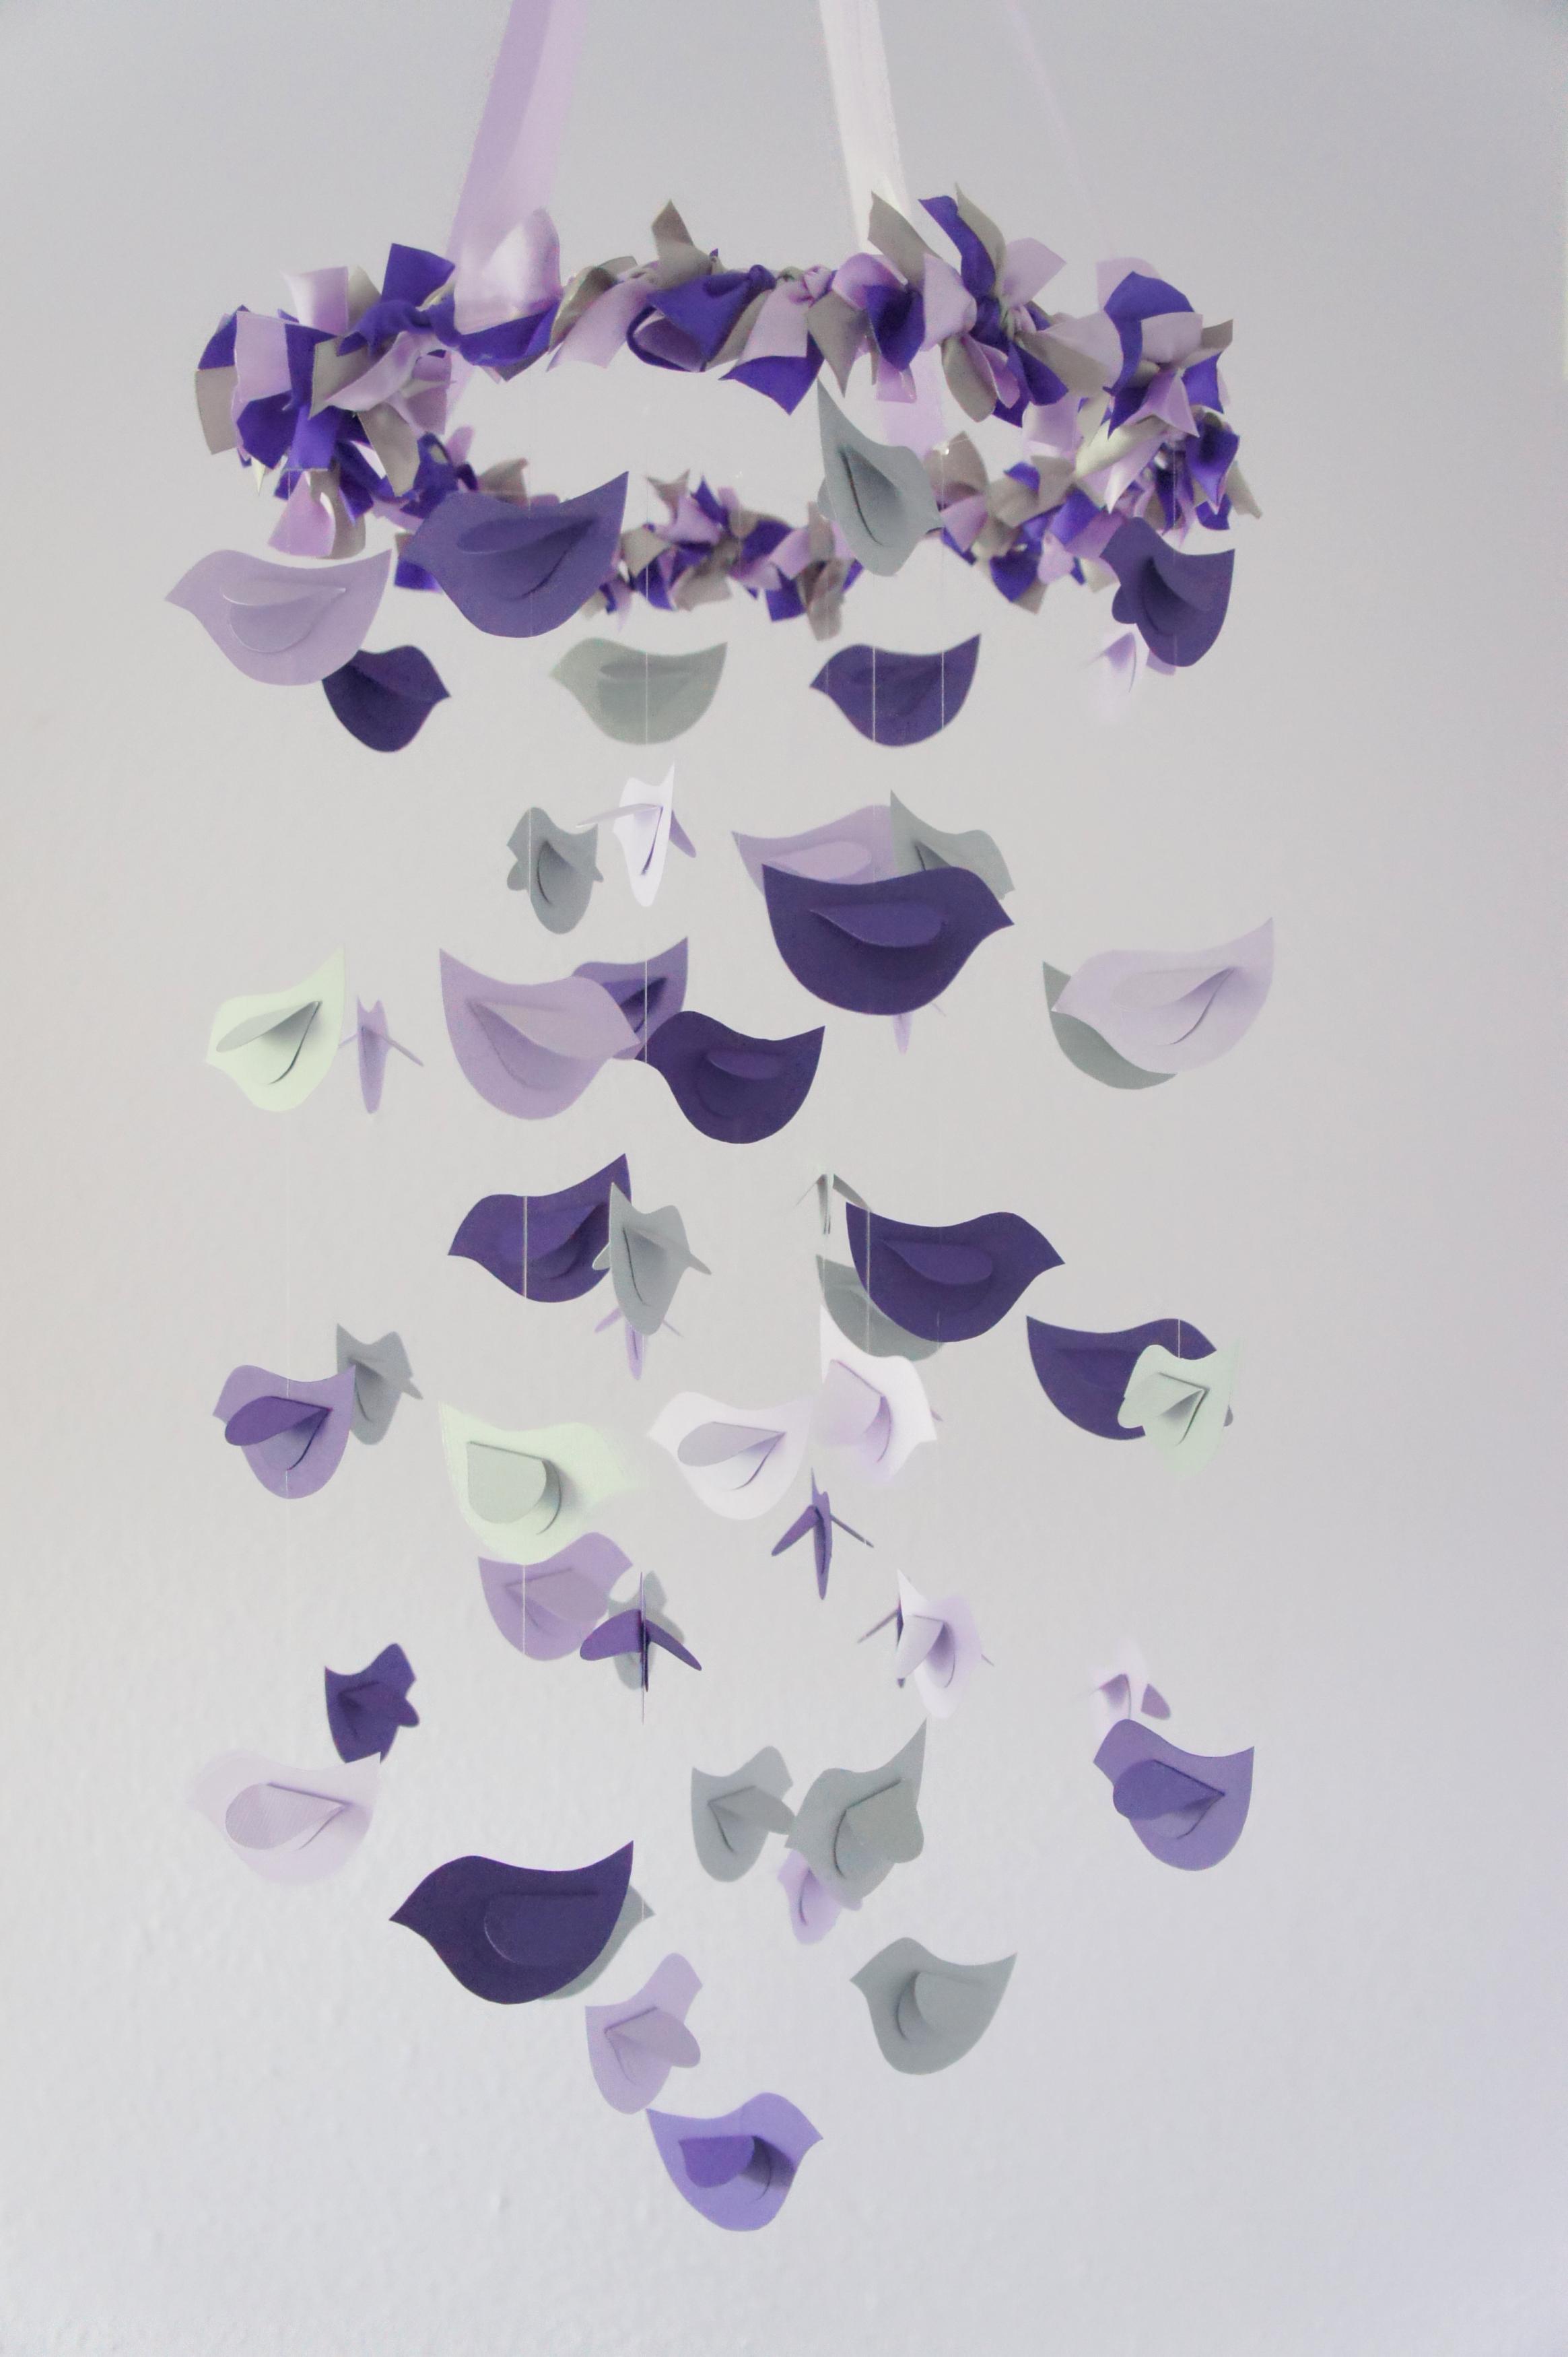 modern nursery mobile birds in purple lavender  grey baby  - modern nursery mobile birds in purple lavender  grey baby shower giftphotographer prop